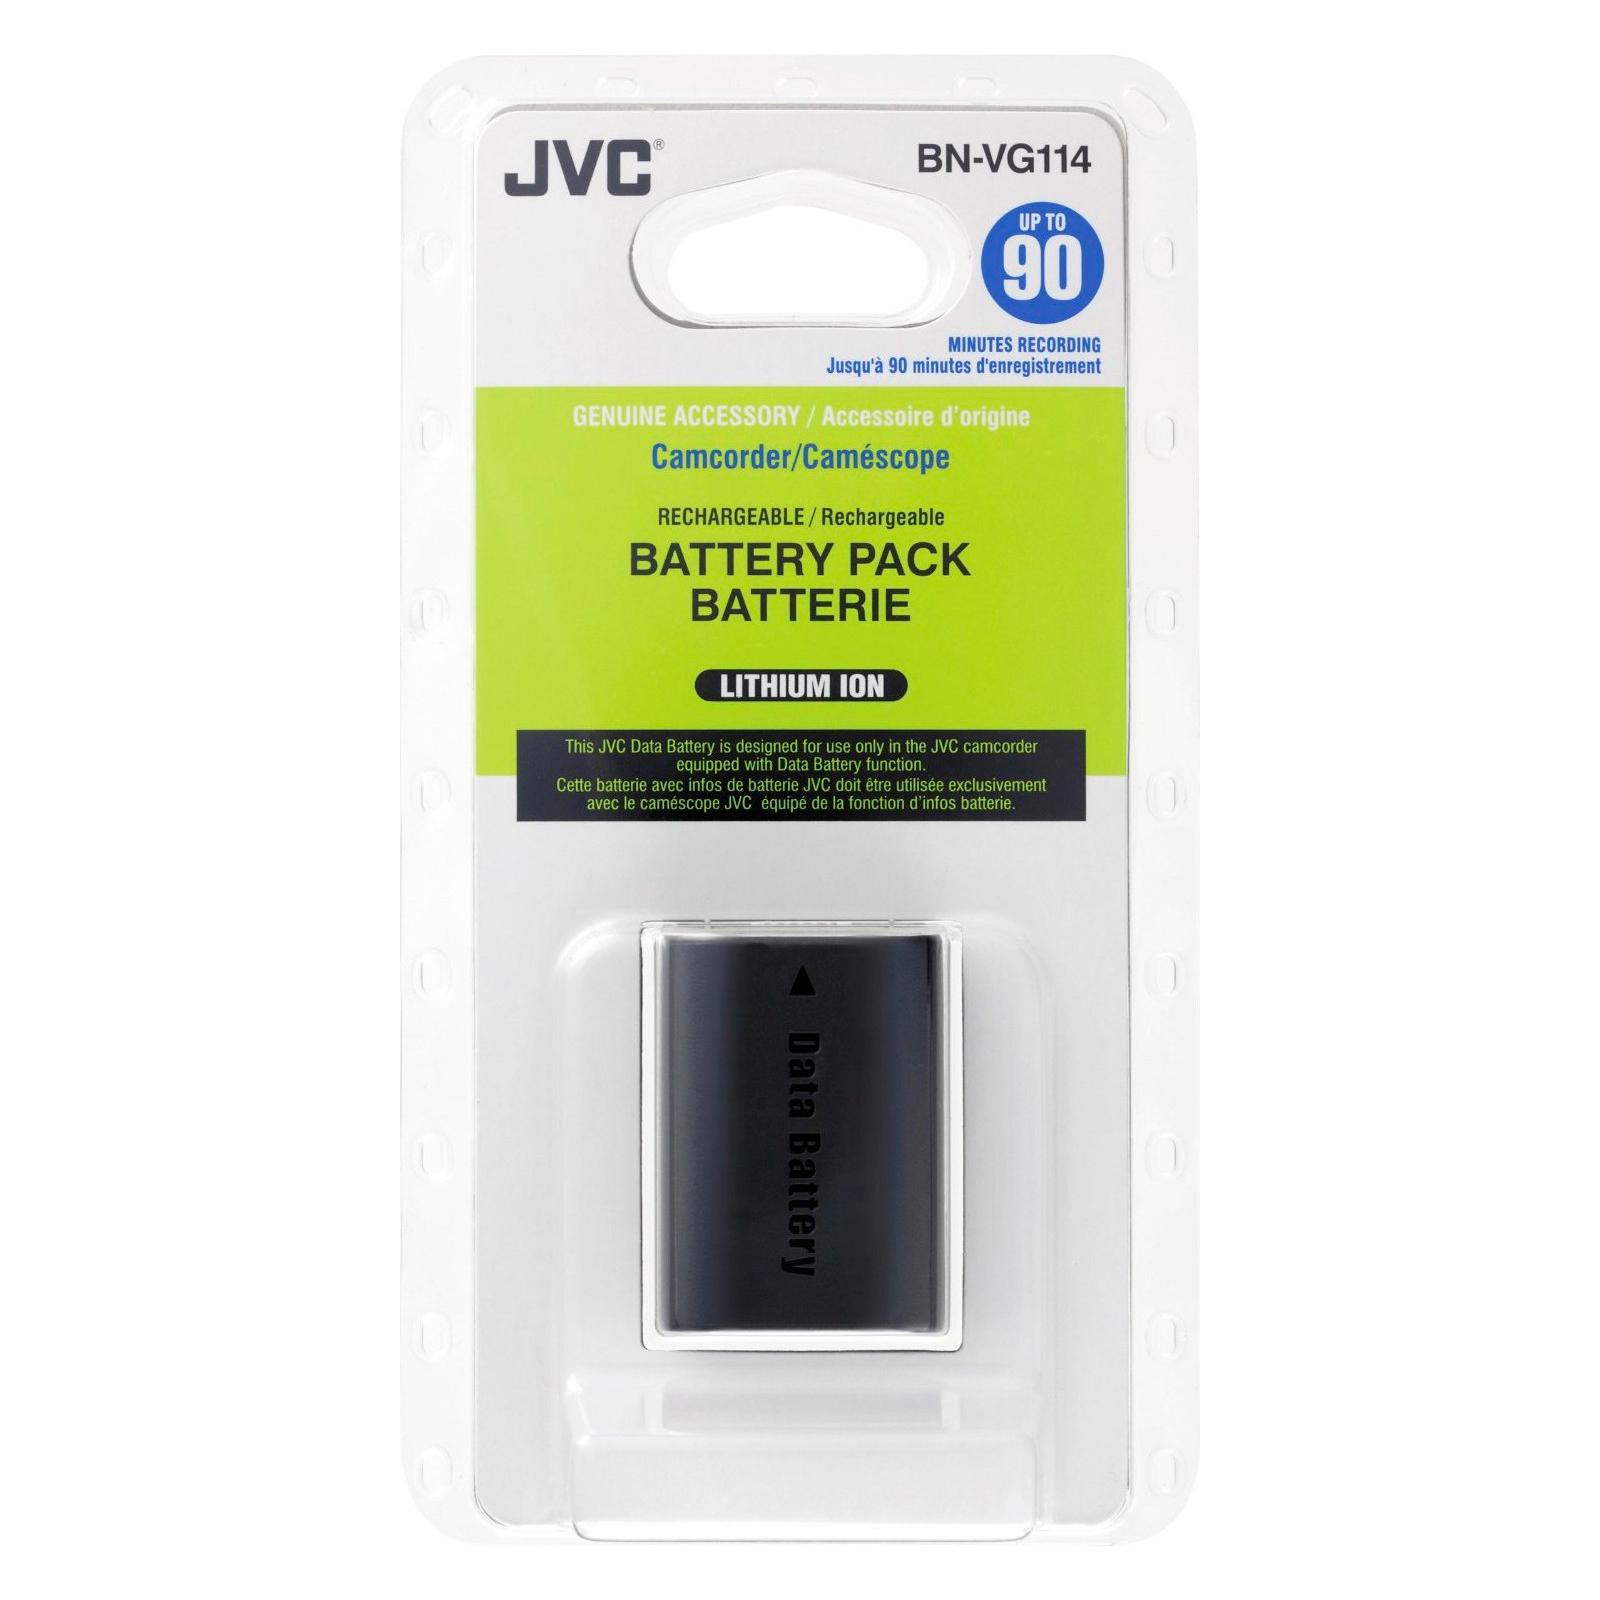 Аккумулятор к фото/видео JVC BN-VG114E изображение 4